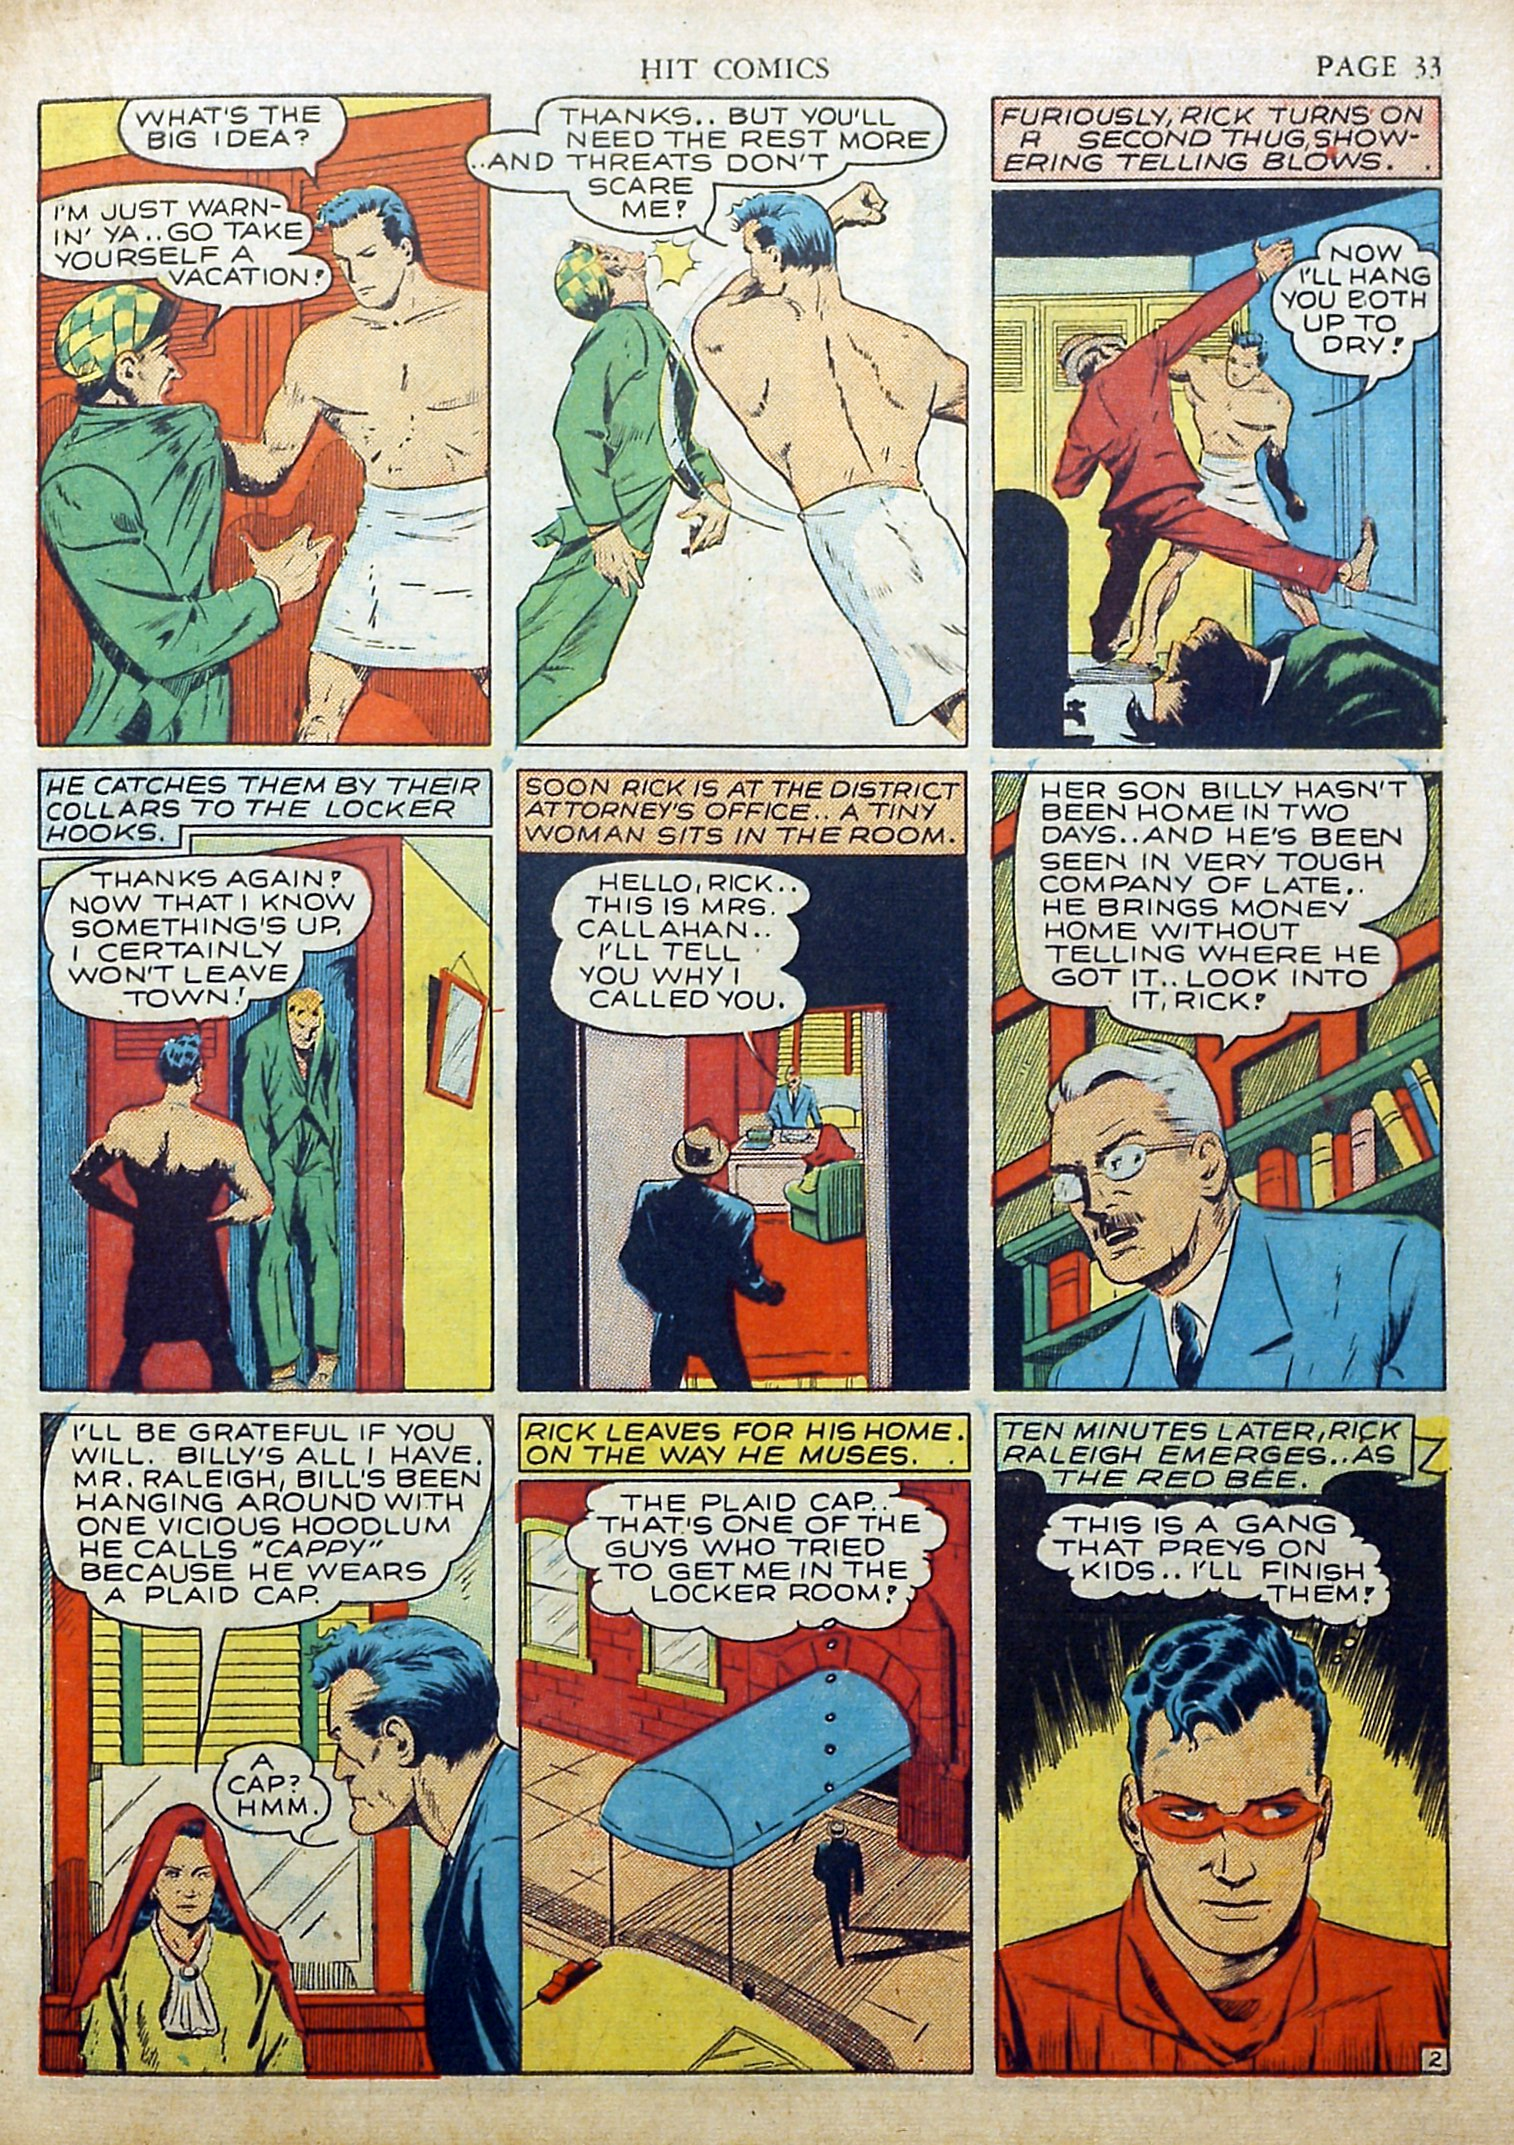 Read online Hit Comics comic -  Issue #17 - 35